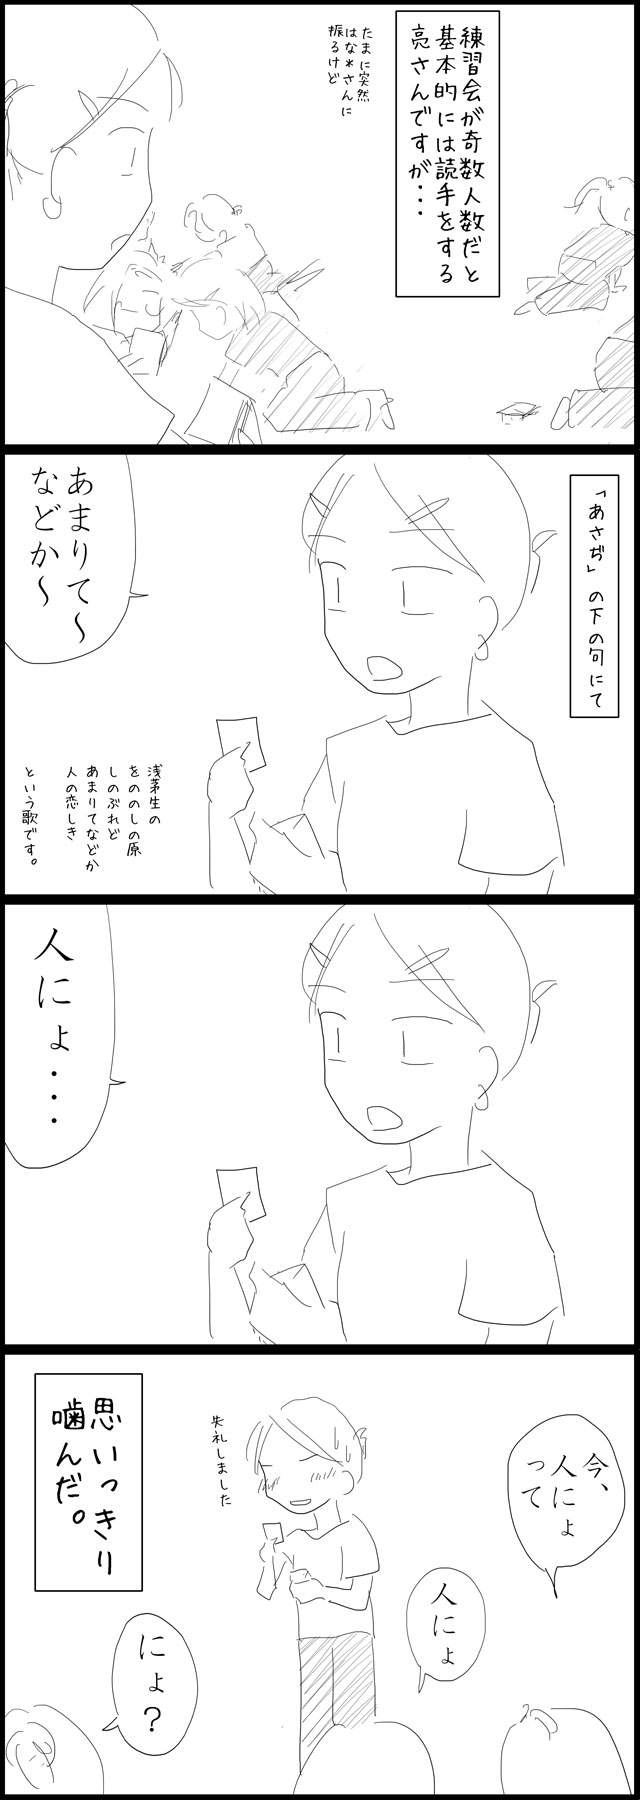 f:id:karutaru:20140809224704j:image:w480